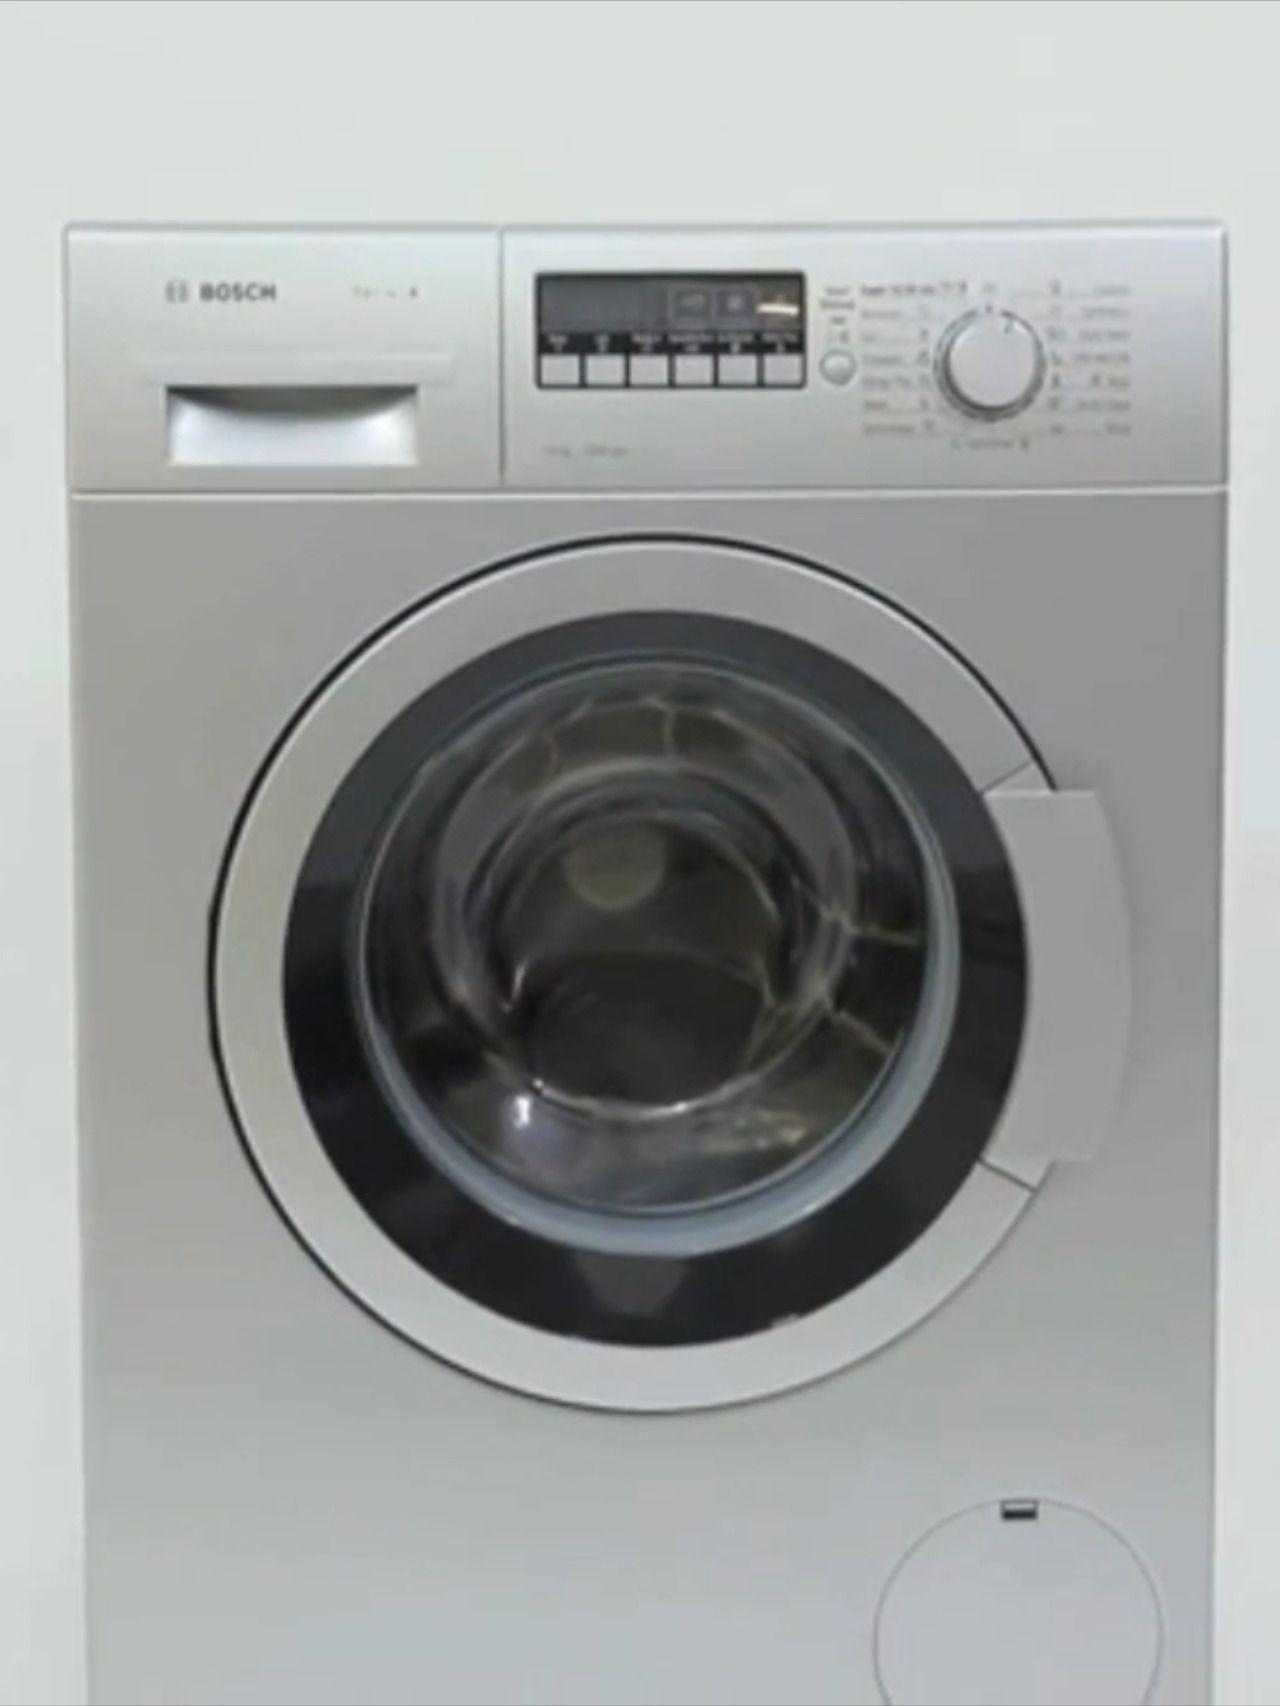 Credit Card Washing Machine Lg Washing Machine Pedestal Pex Washing Machine Valve How Does Bleach Dispenser In 2020 Credit Card Machine Washing Machine Card Machine